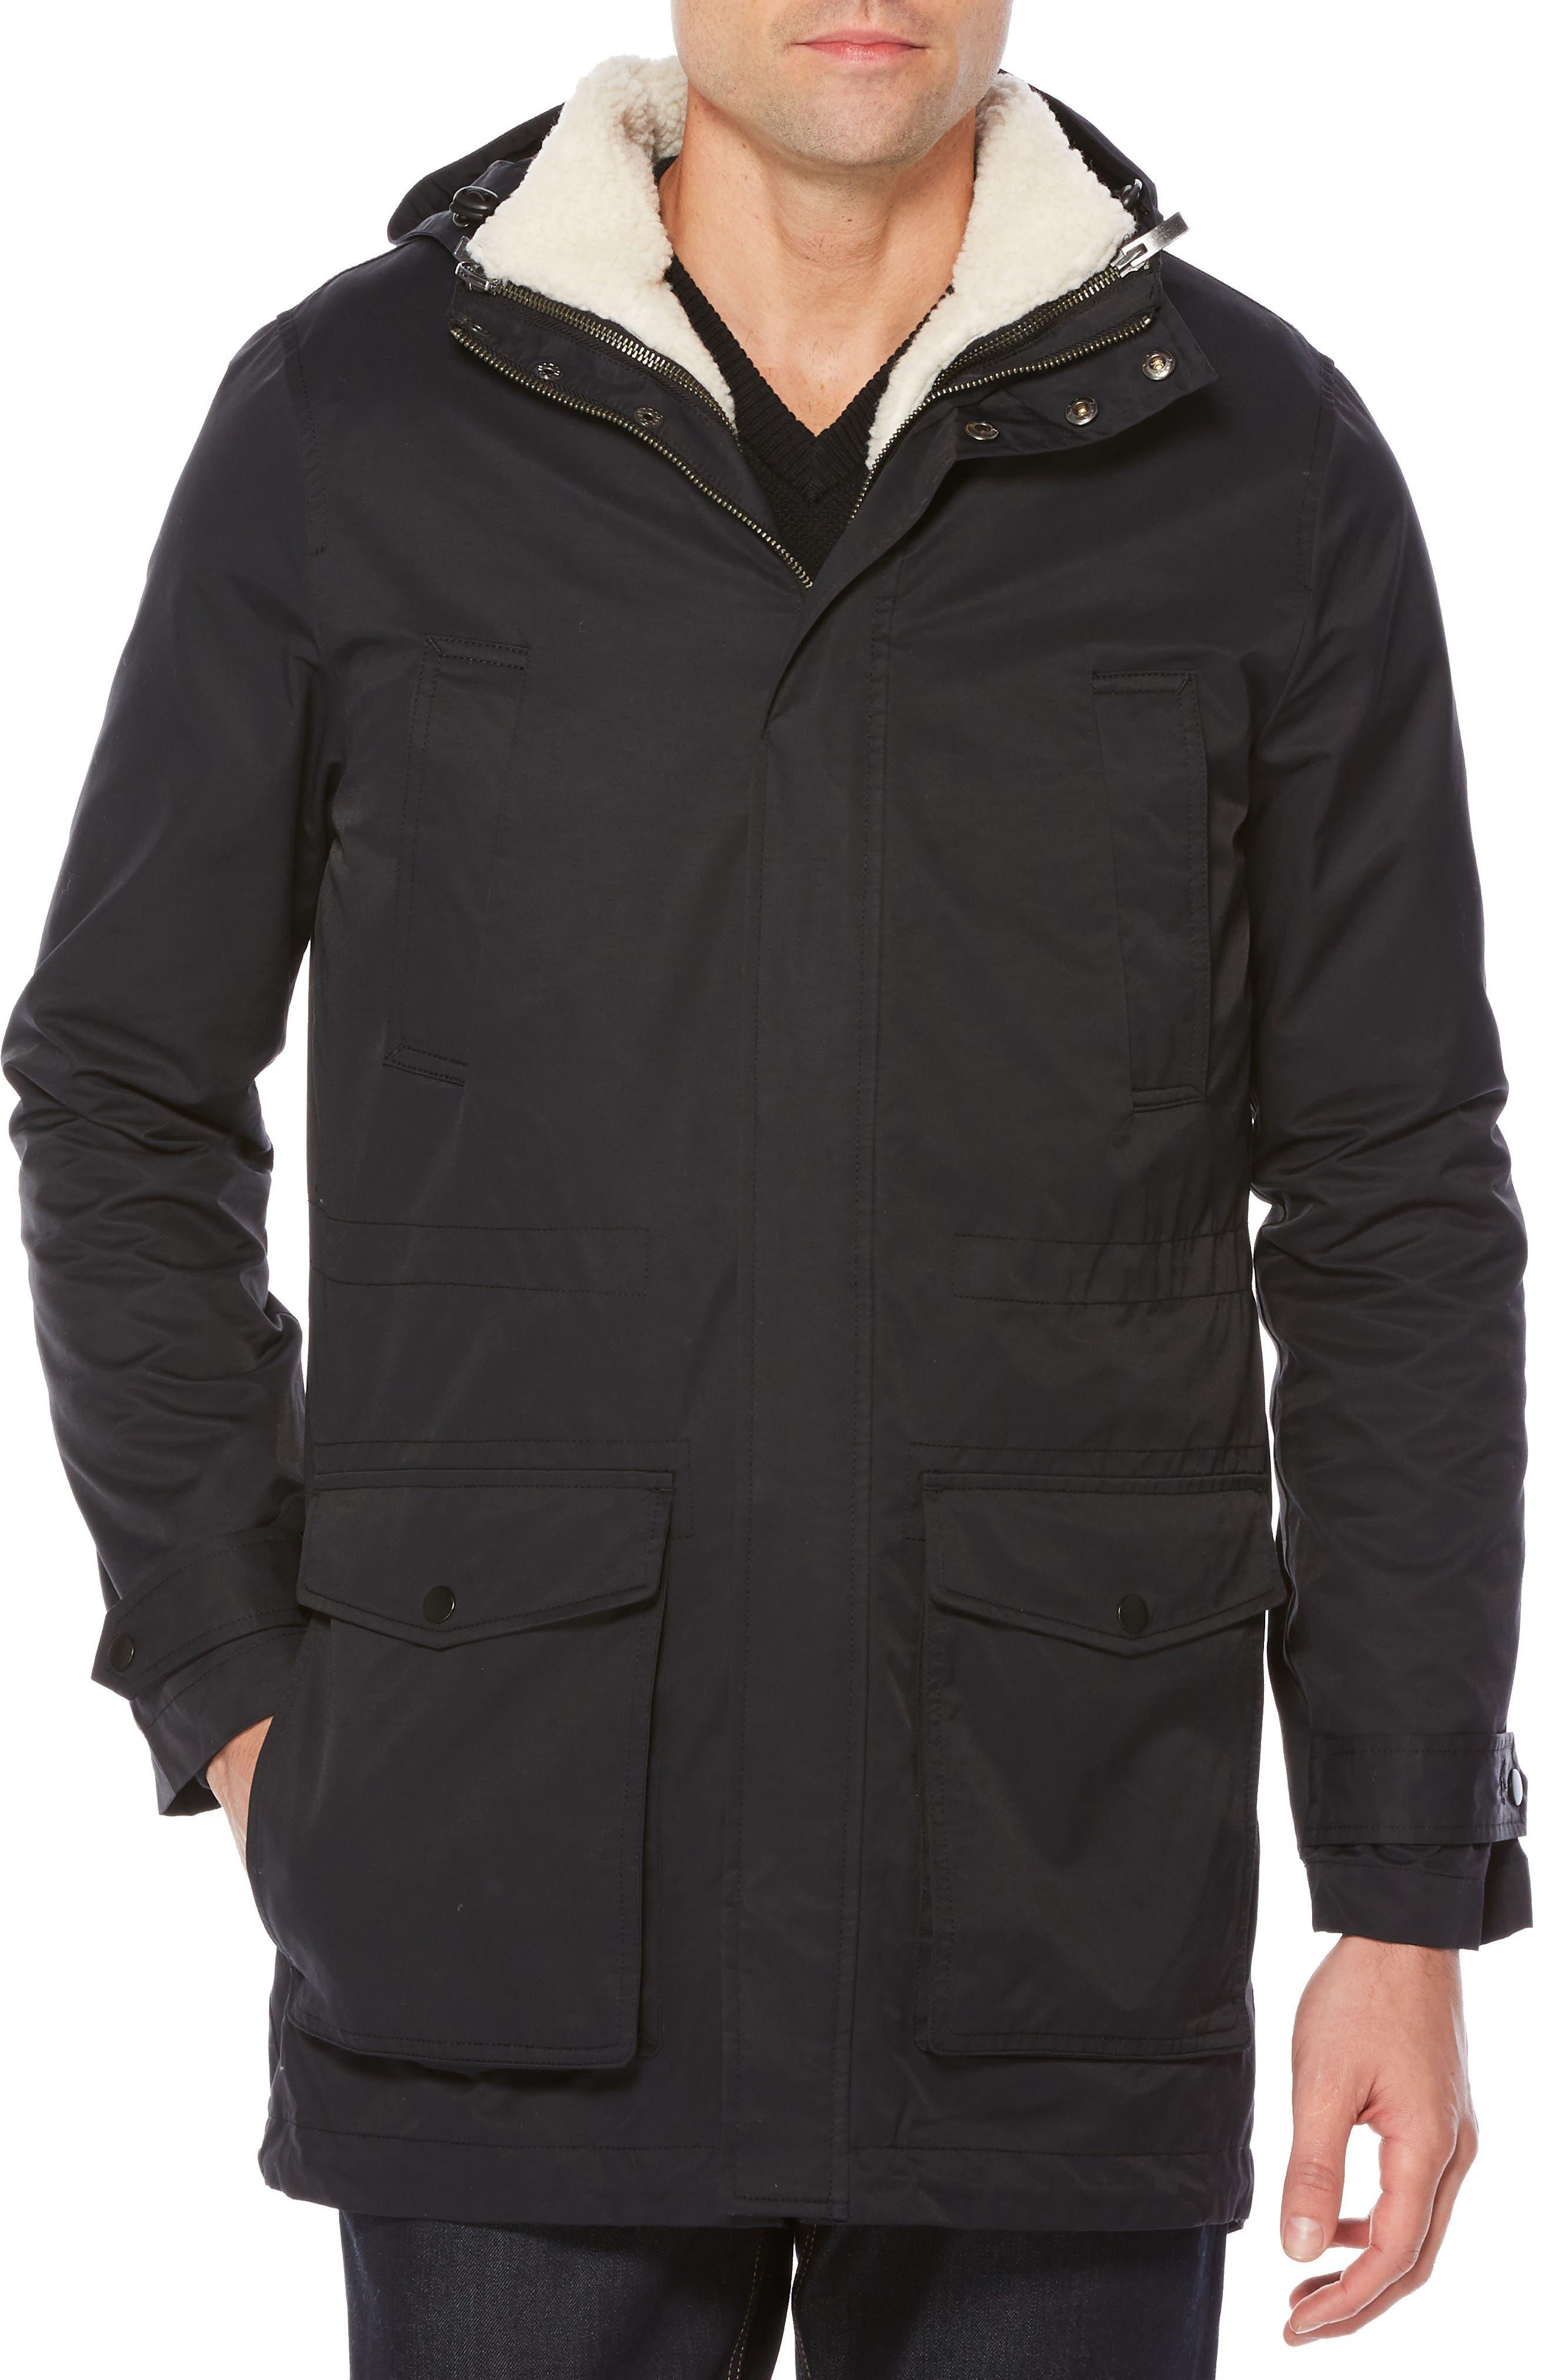 4-in-1 Water Resistant Jacket,                         Main,                         color, True Black